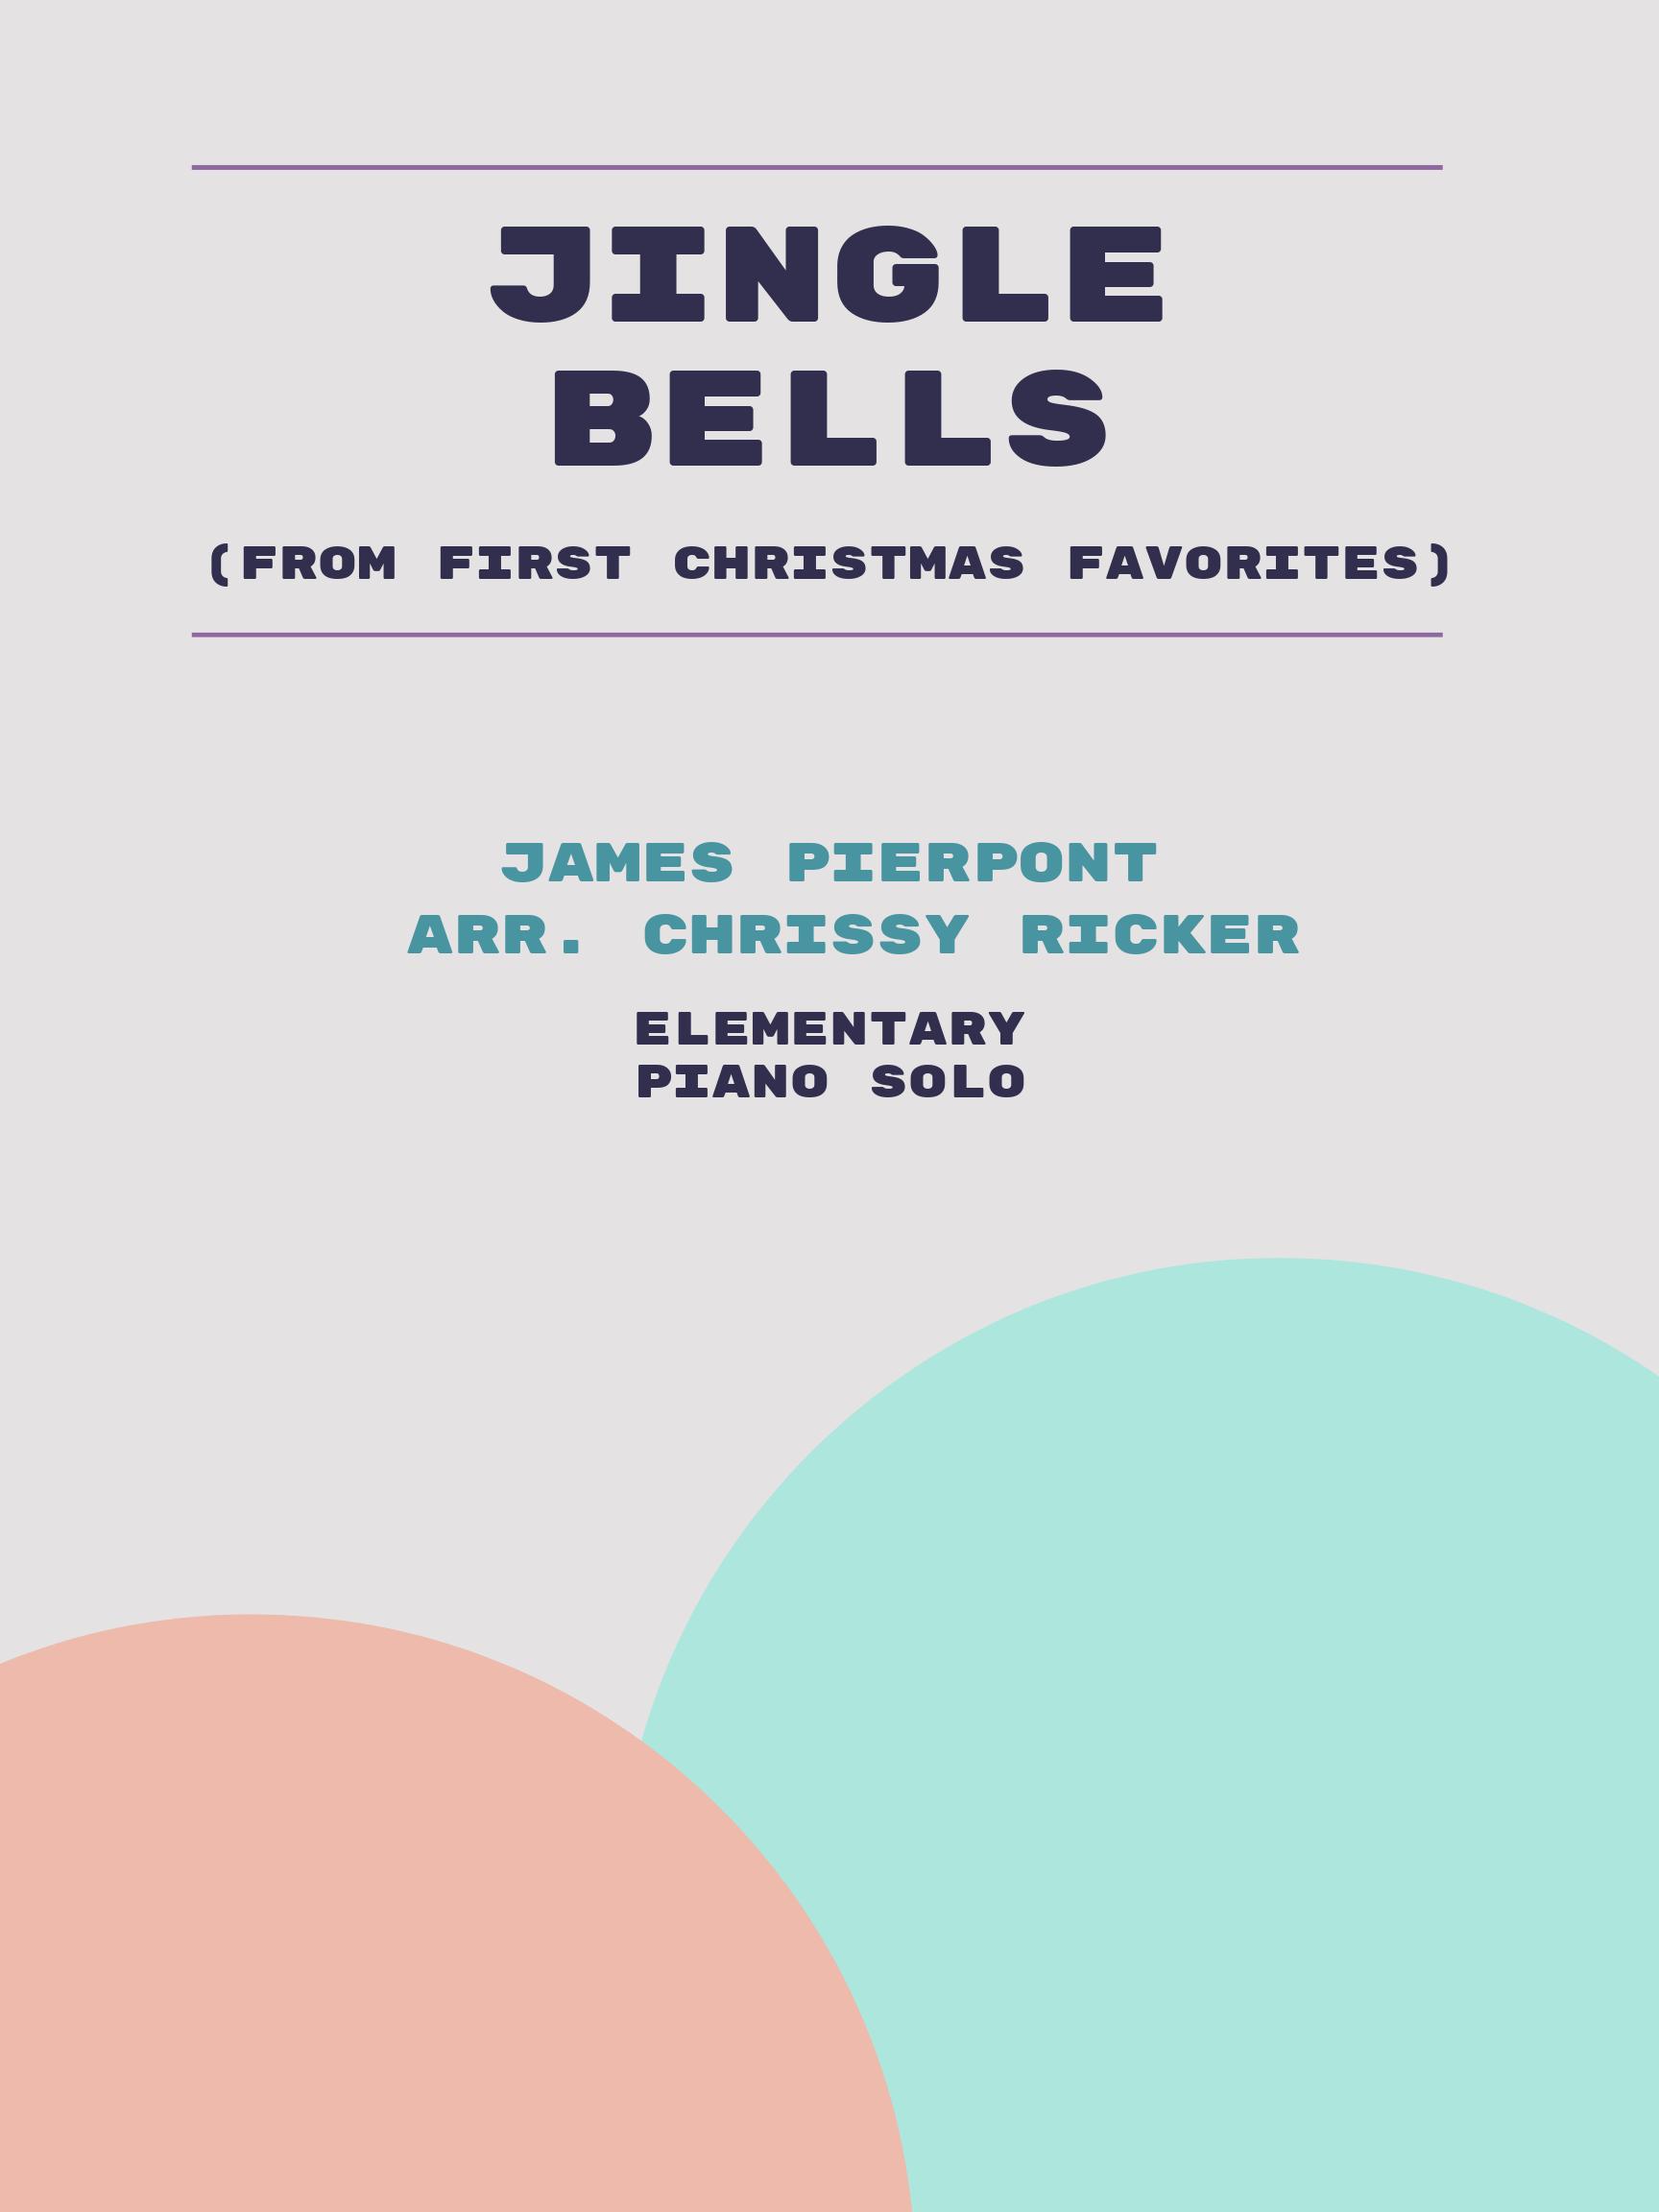 Jingle Bells by James Pierpont